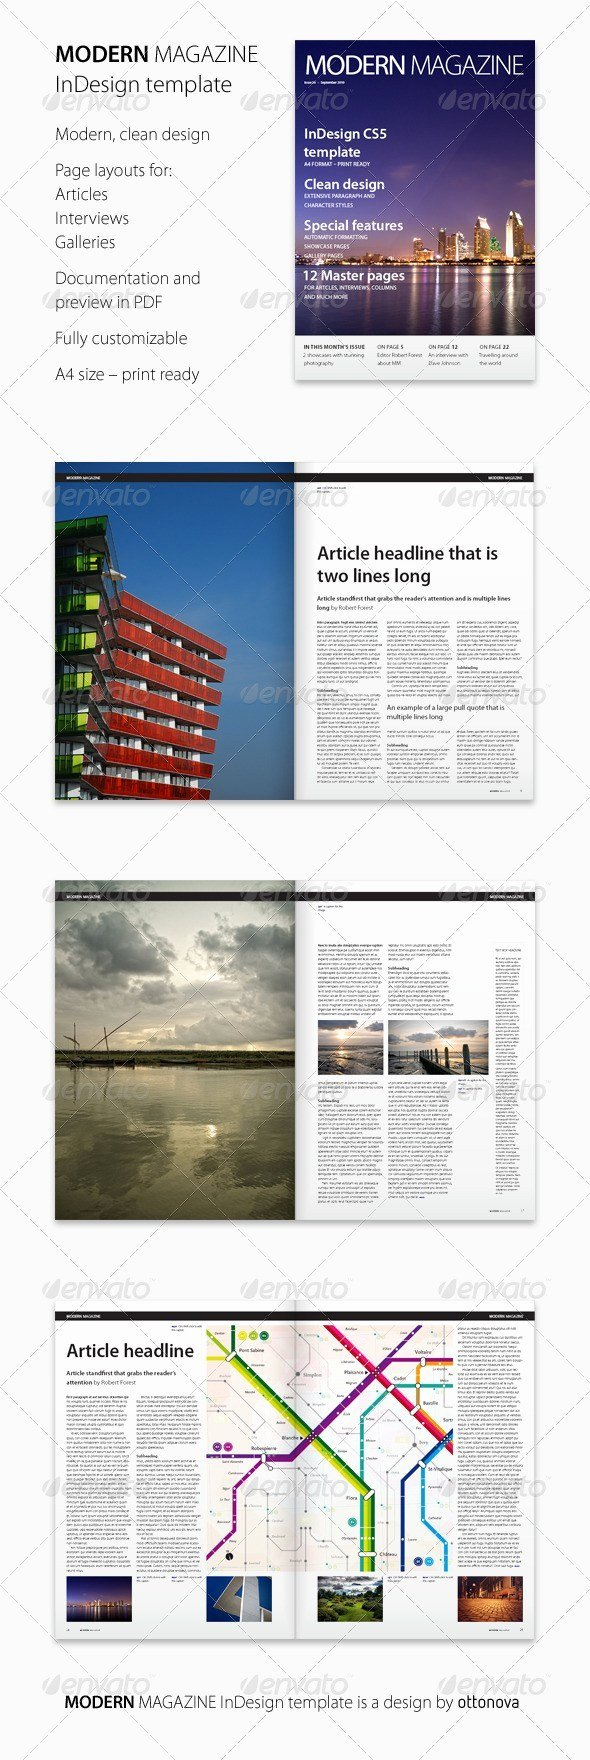 Photoshop Magazine Template New 55 Best Magazine Templates Shop Psd & Indesign